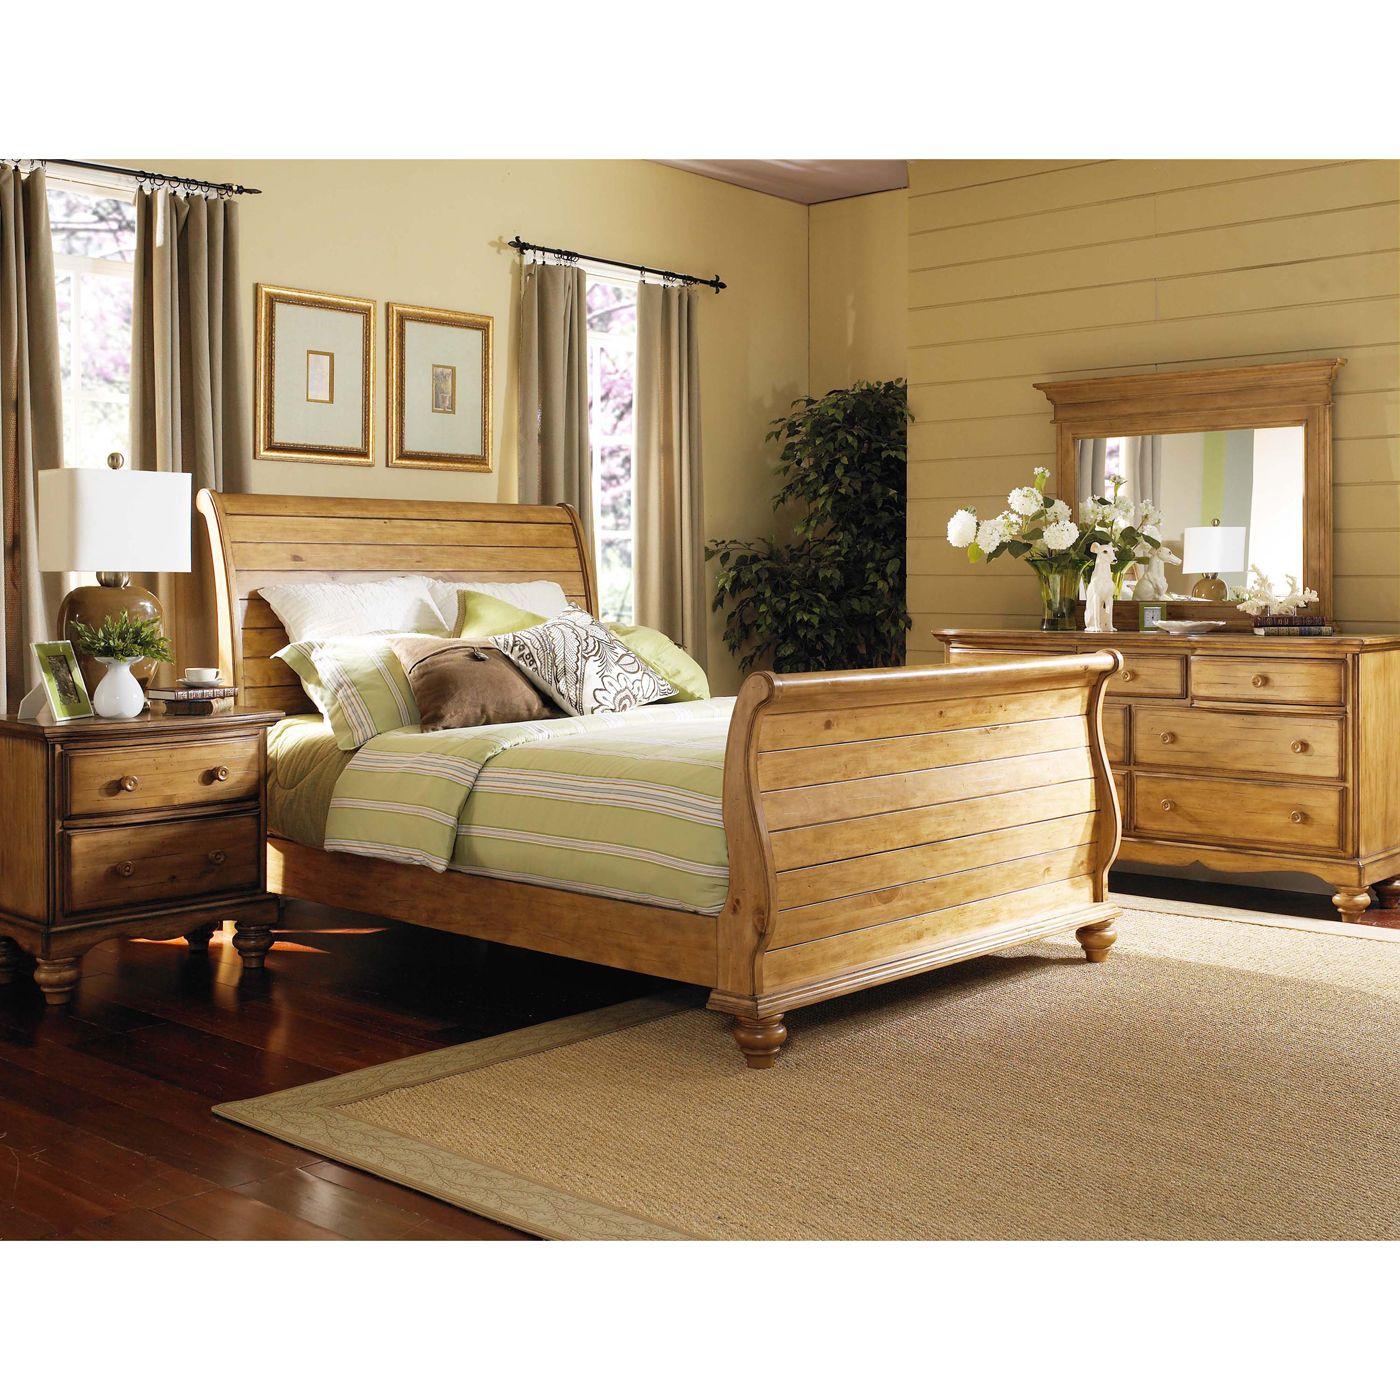 Hillsdale furniture hamptons bedroom set rustic u country